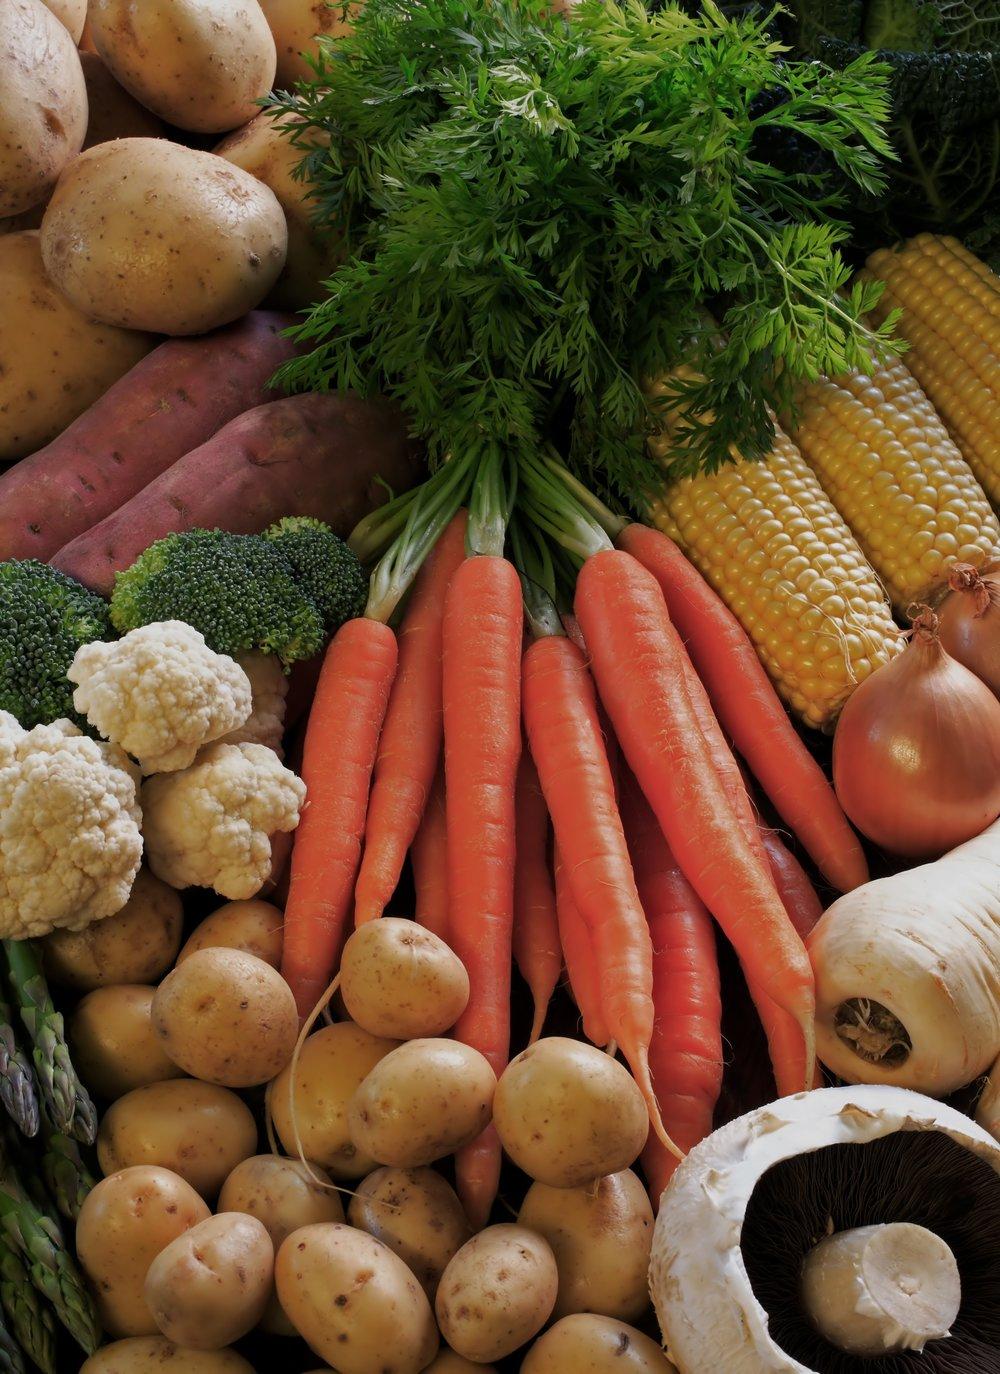 bigstock-Organic-Vegetables-1174895.jpg